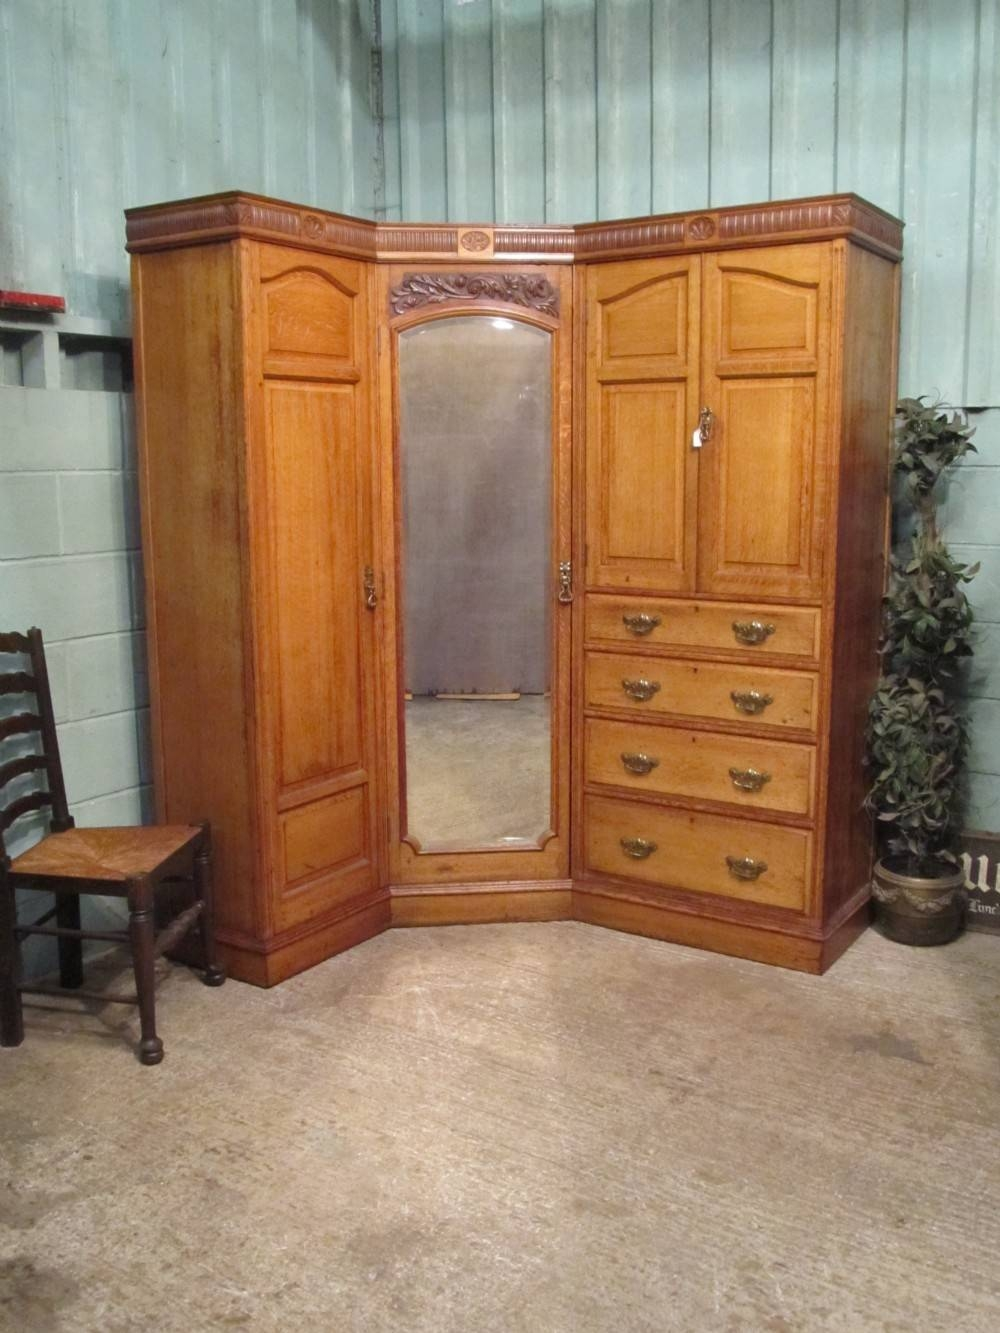 Antique Edwardian Oak Corner Wardrobe Compactum C1900 | 310742 with Oak Corner Wardrobes (Image 3 of 15)